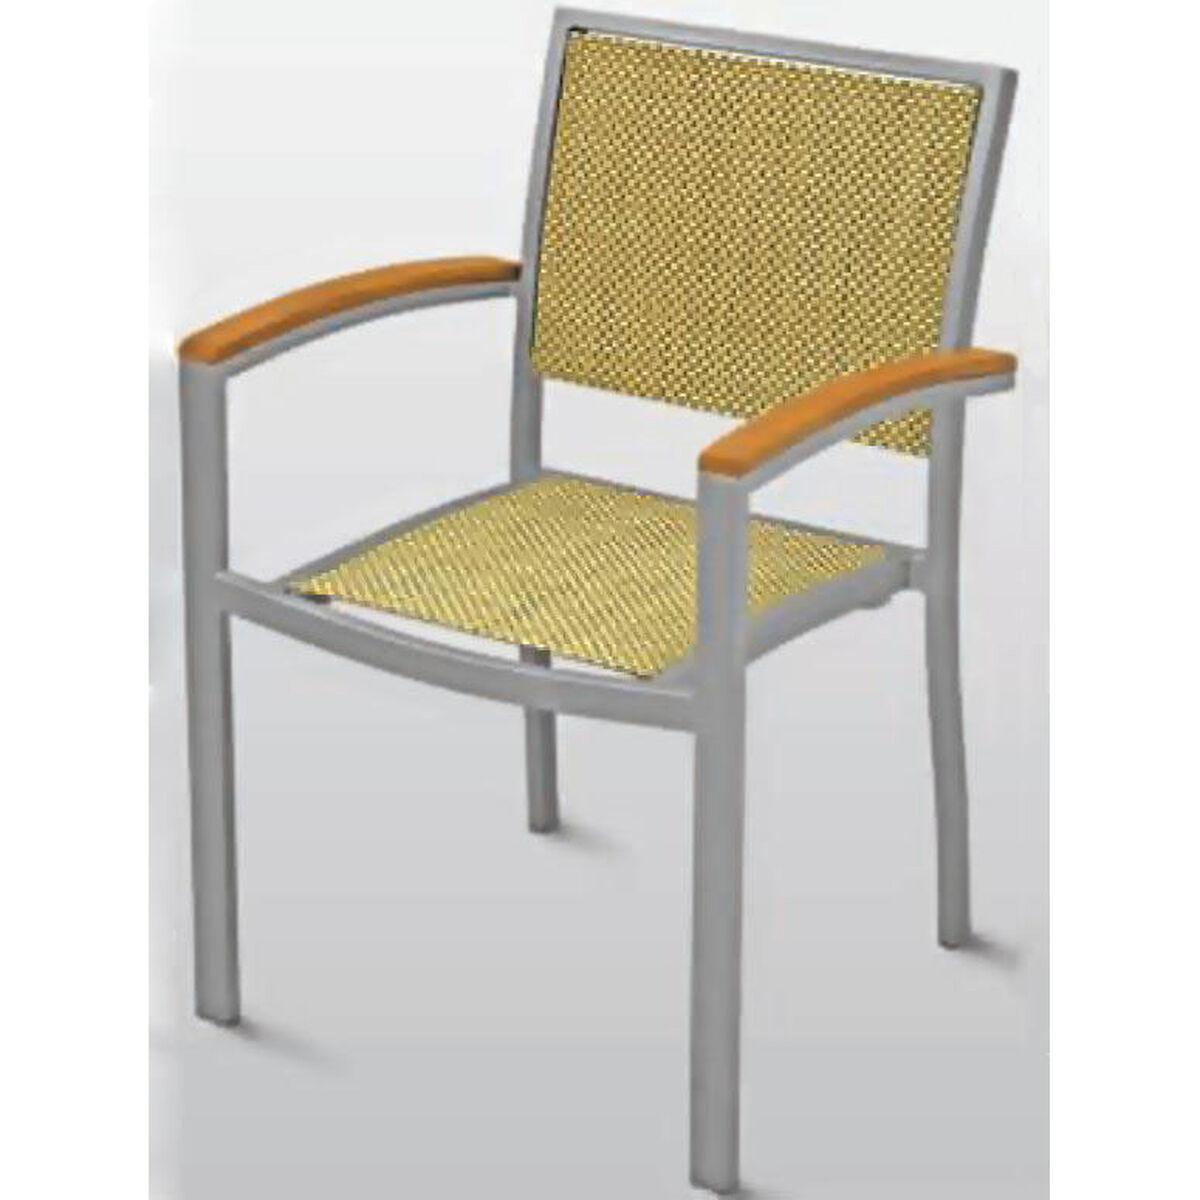 Stacking Arm Chair Outdoor Al 5624 70tw0077 Bizchair Com